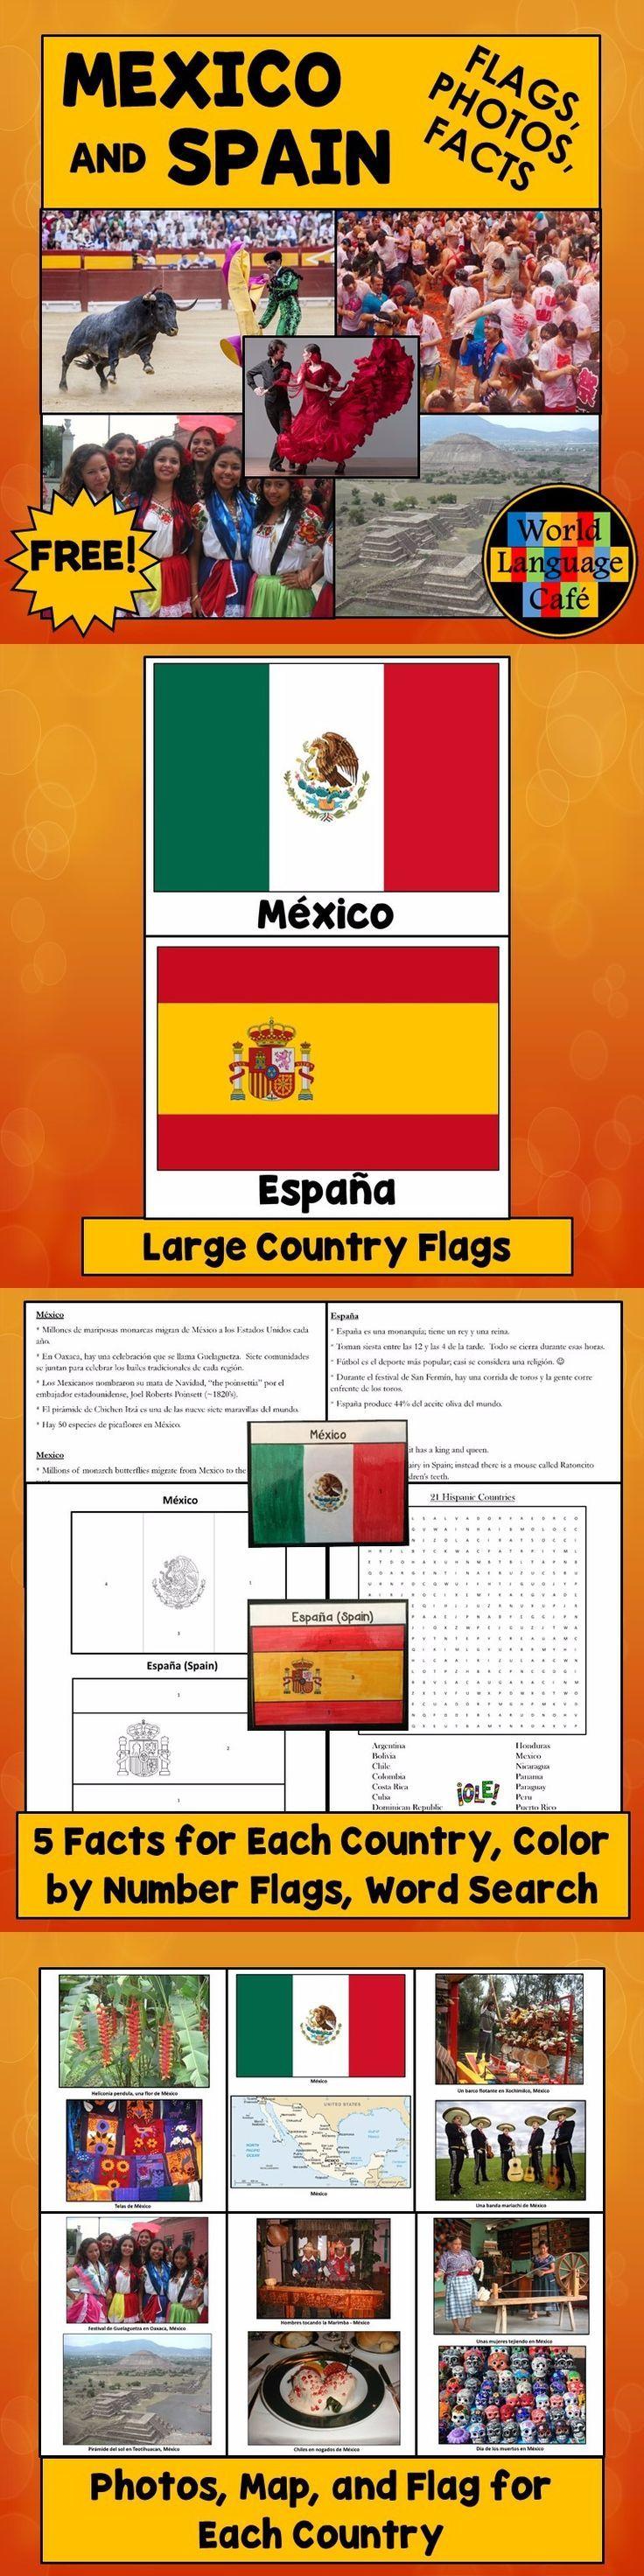 Spanish Speaking Countries Maps - 123TeachMe.com